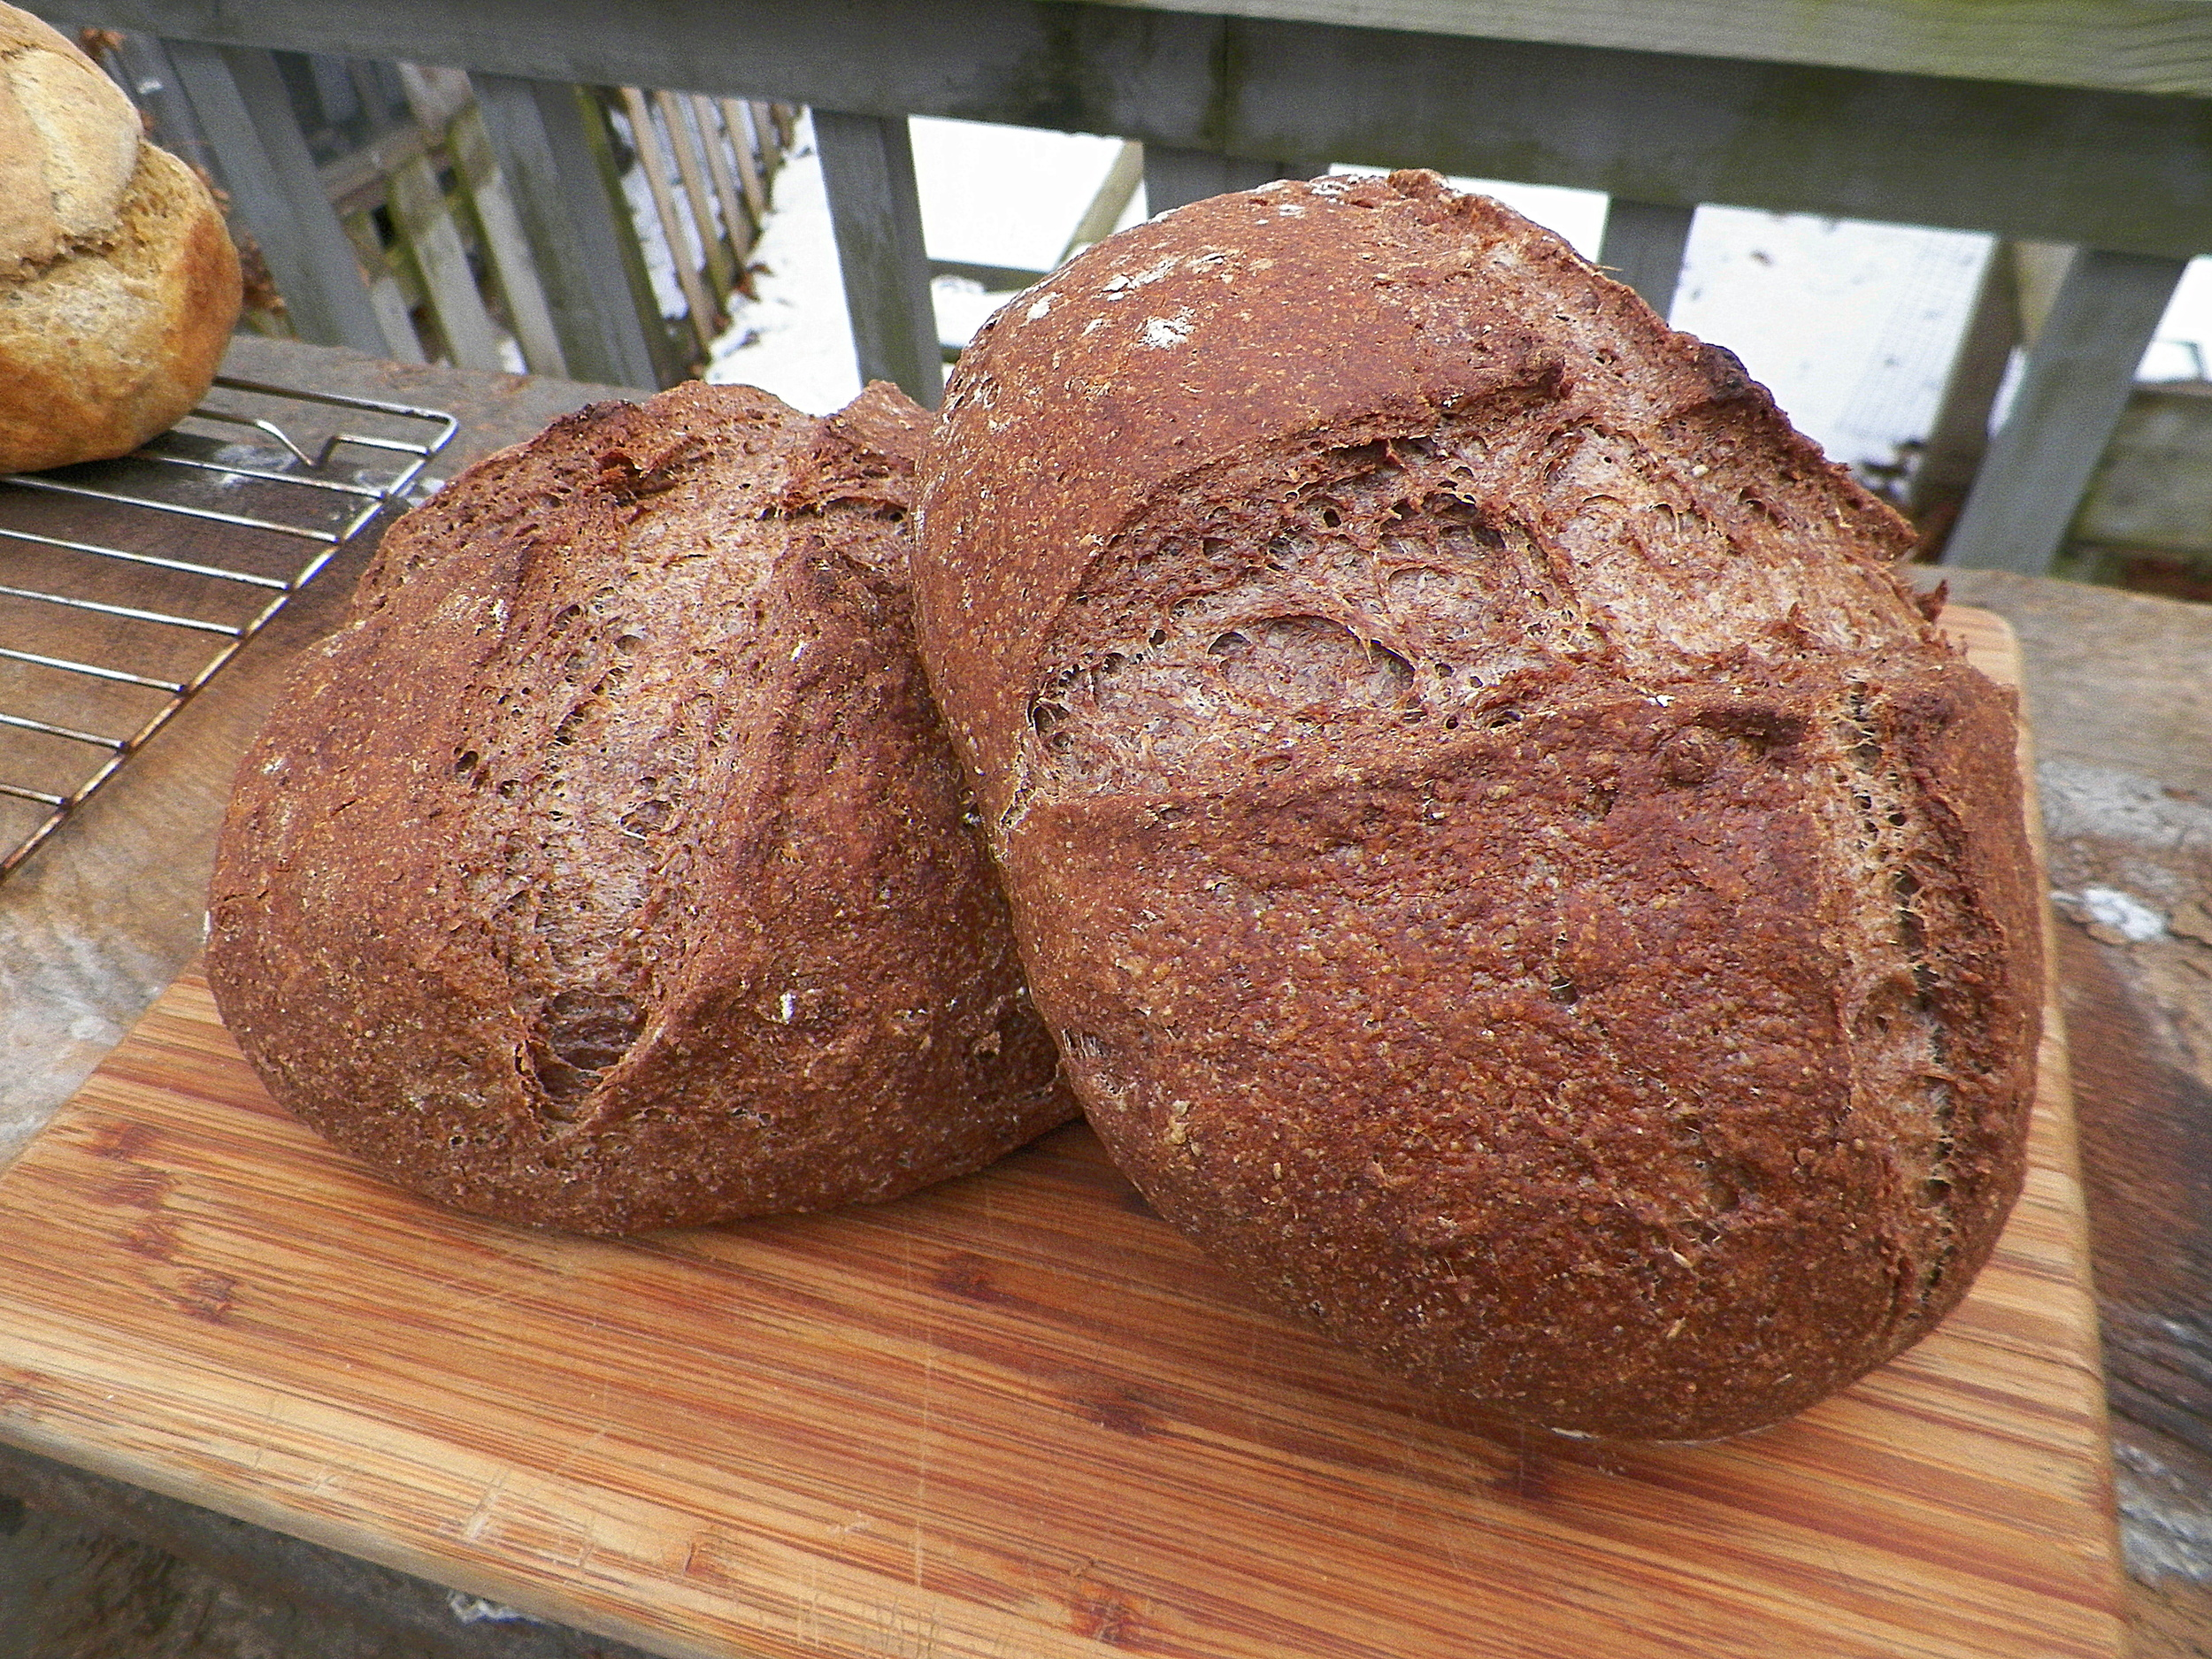 Acorn bread.